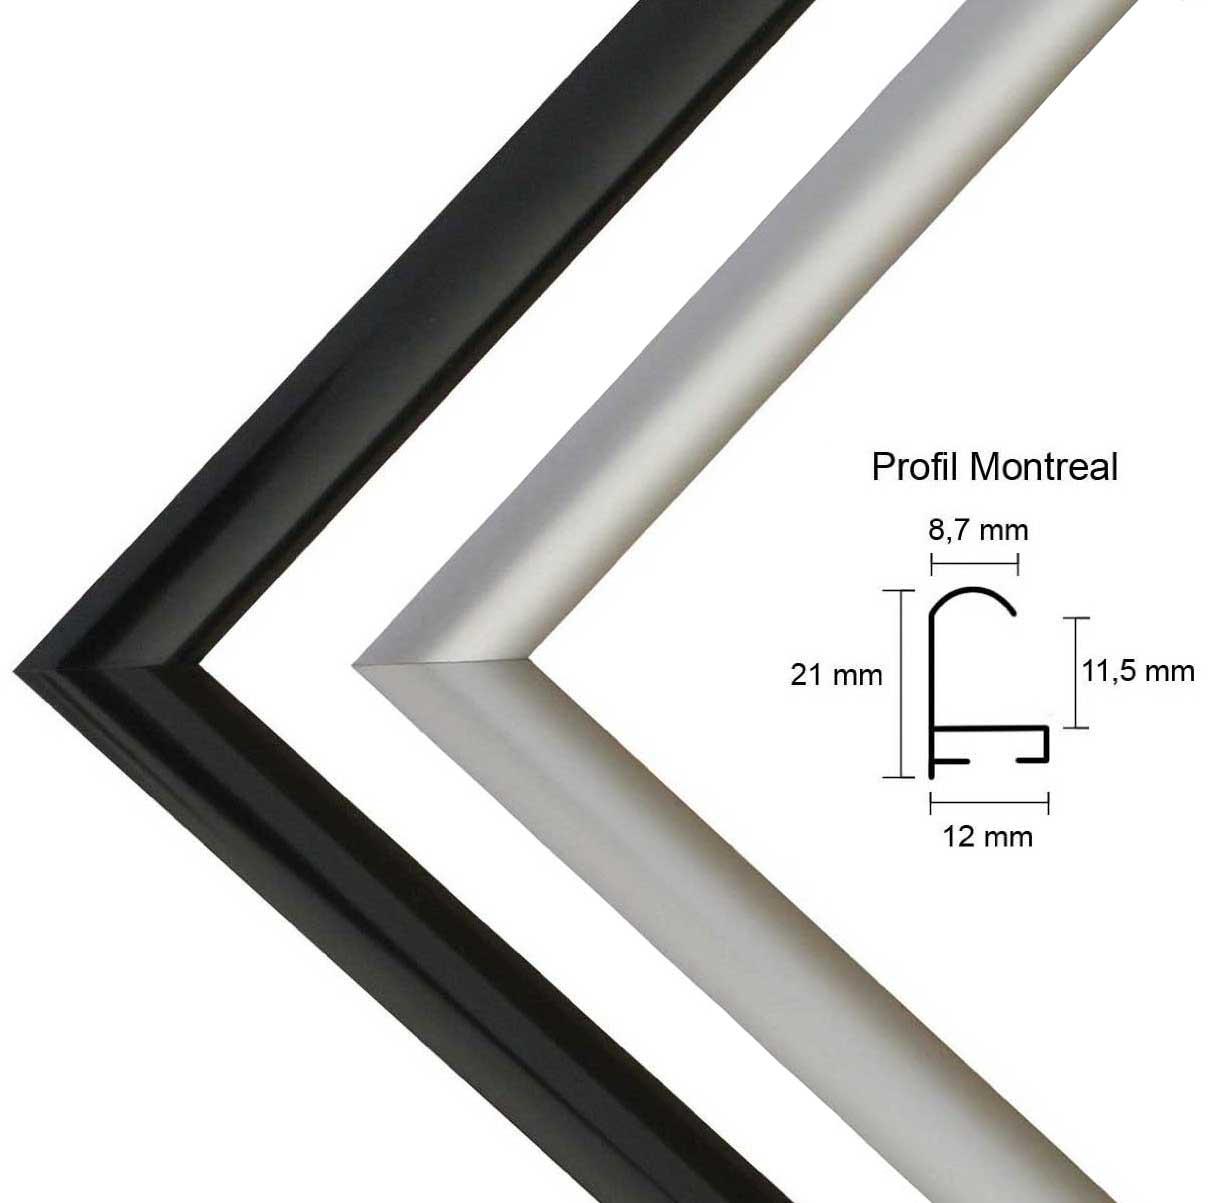 aluminium bilderrahmen 25 x 51 bis 29 x 60 cm montreal farbwahl ebay. Black Bedroom Furniture Sets. Home Design Ideas